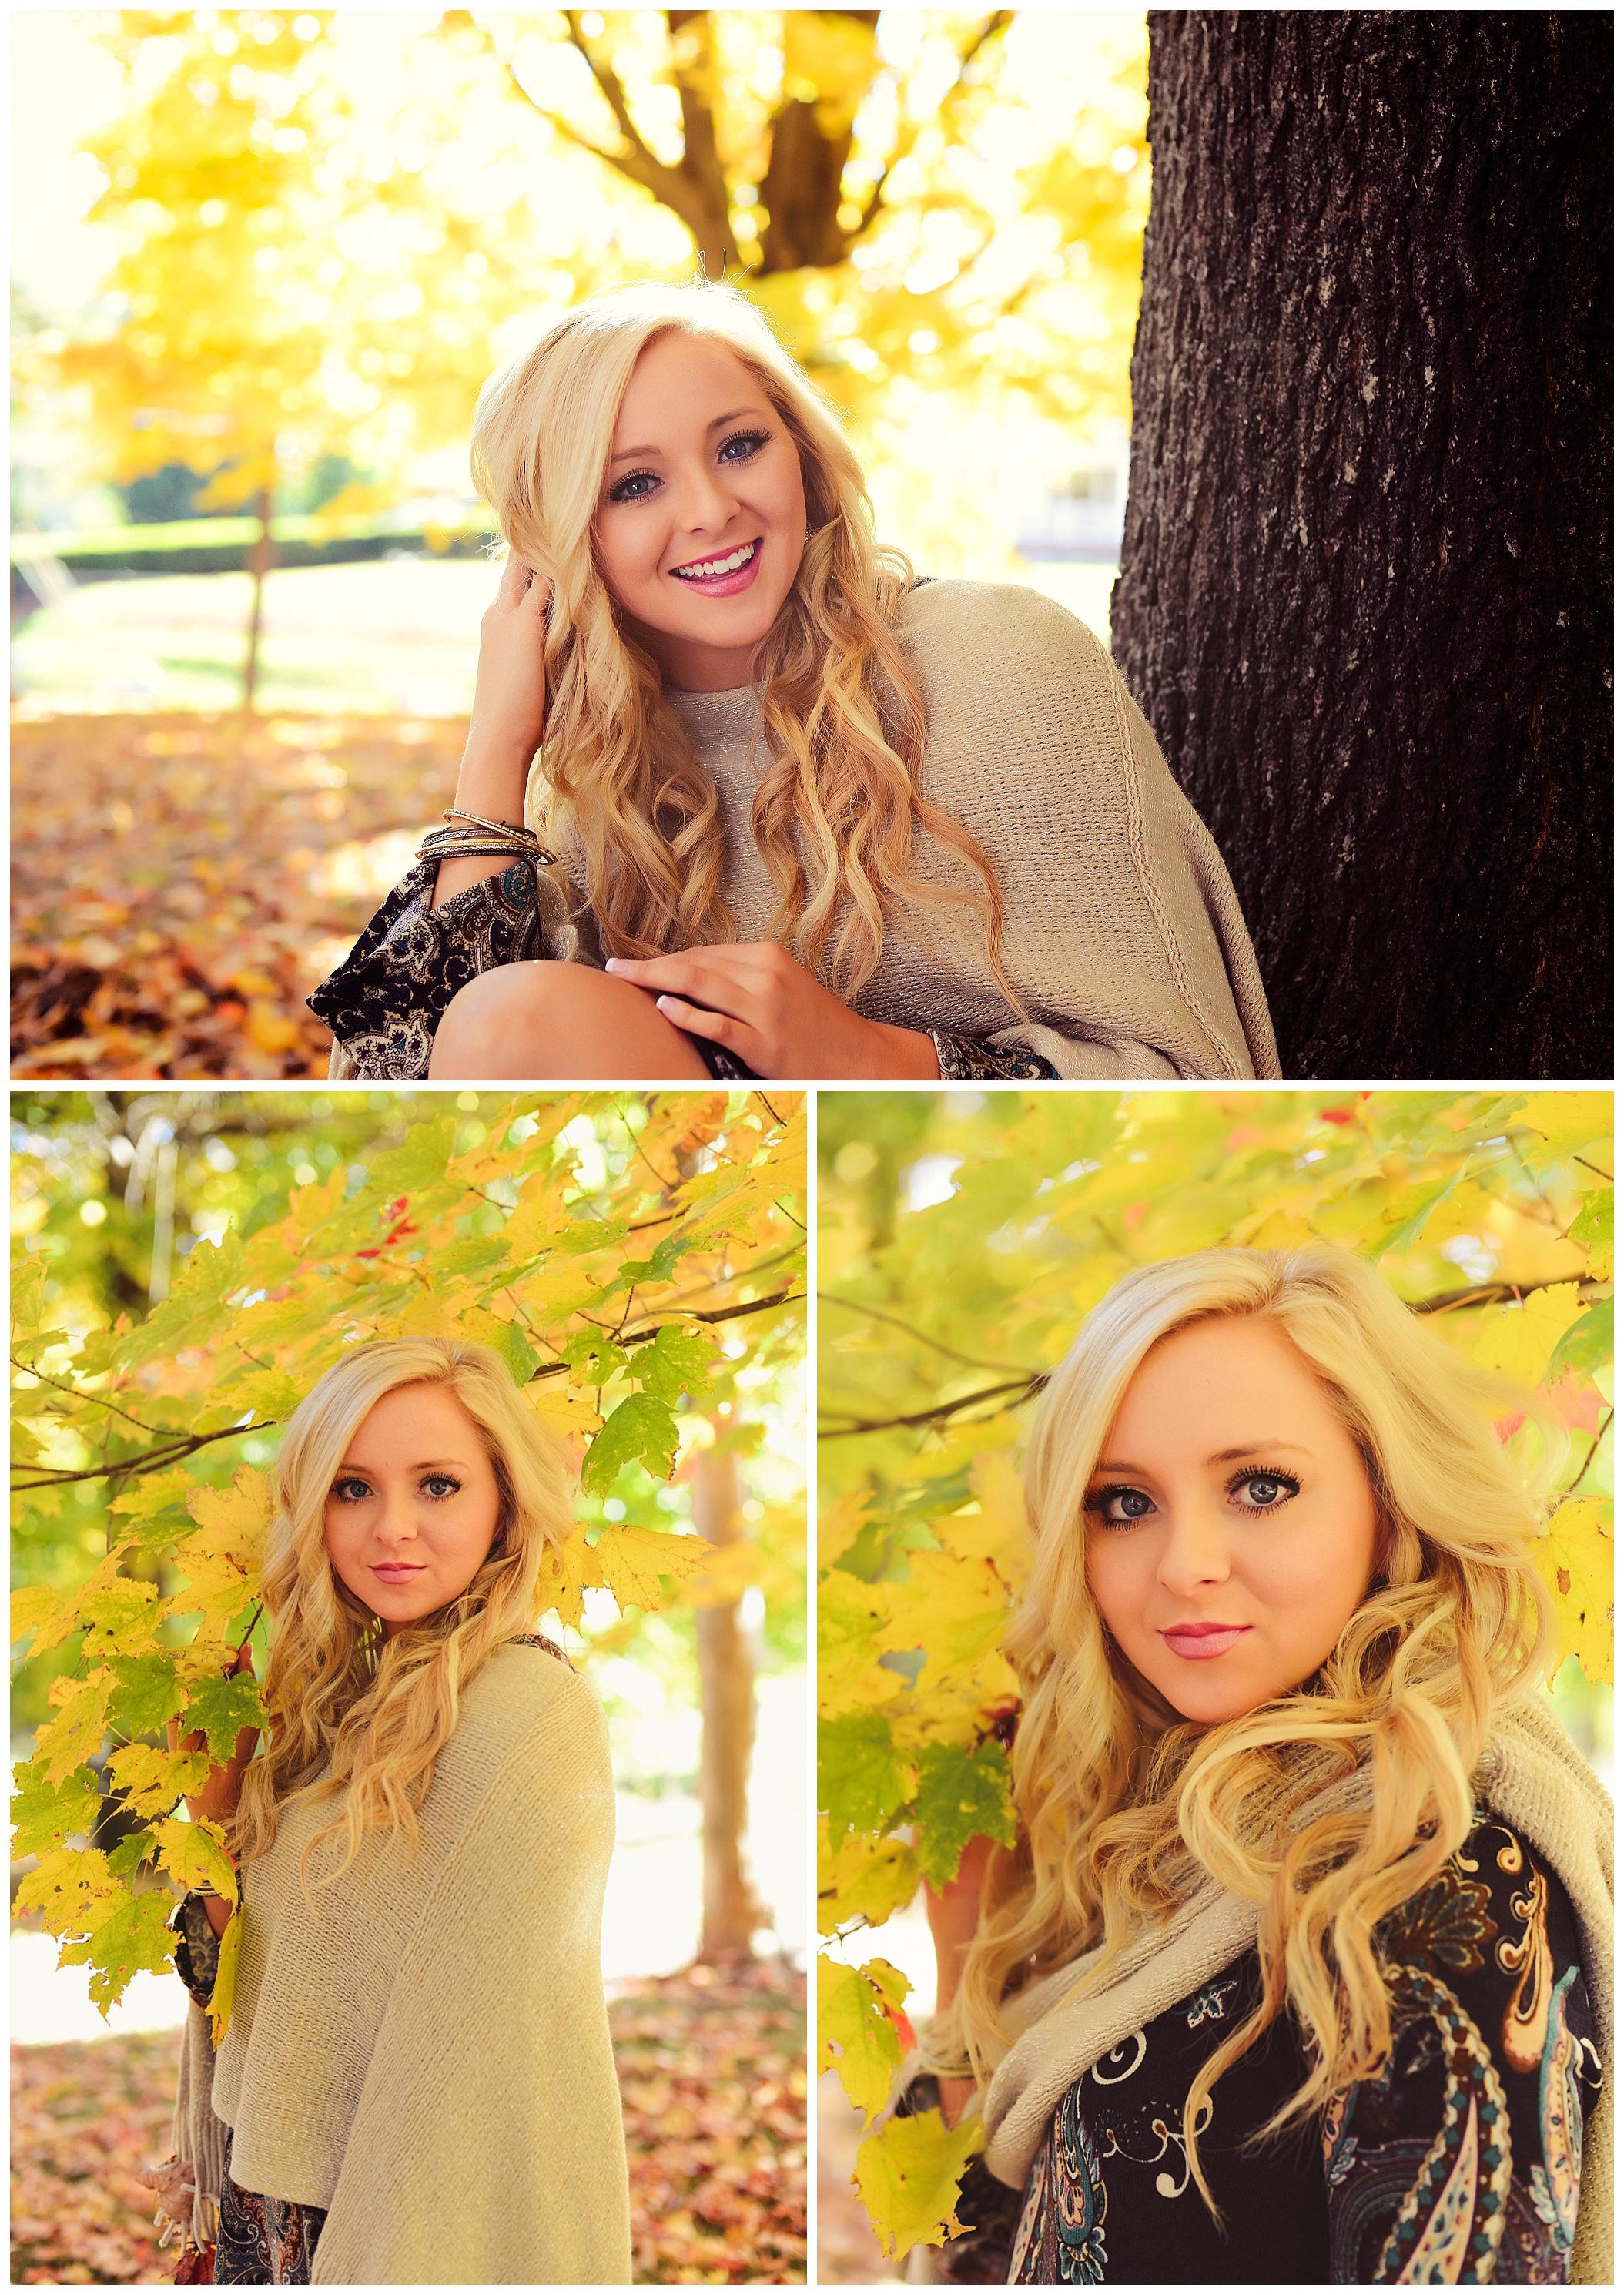 Mount Sterling Kentucky Senior Photographer | Carrie Wilson Photography